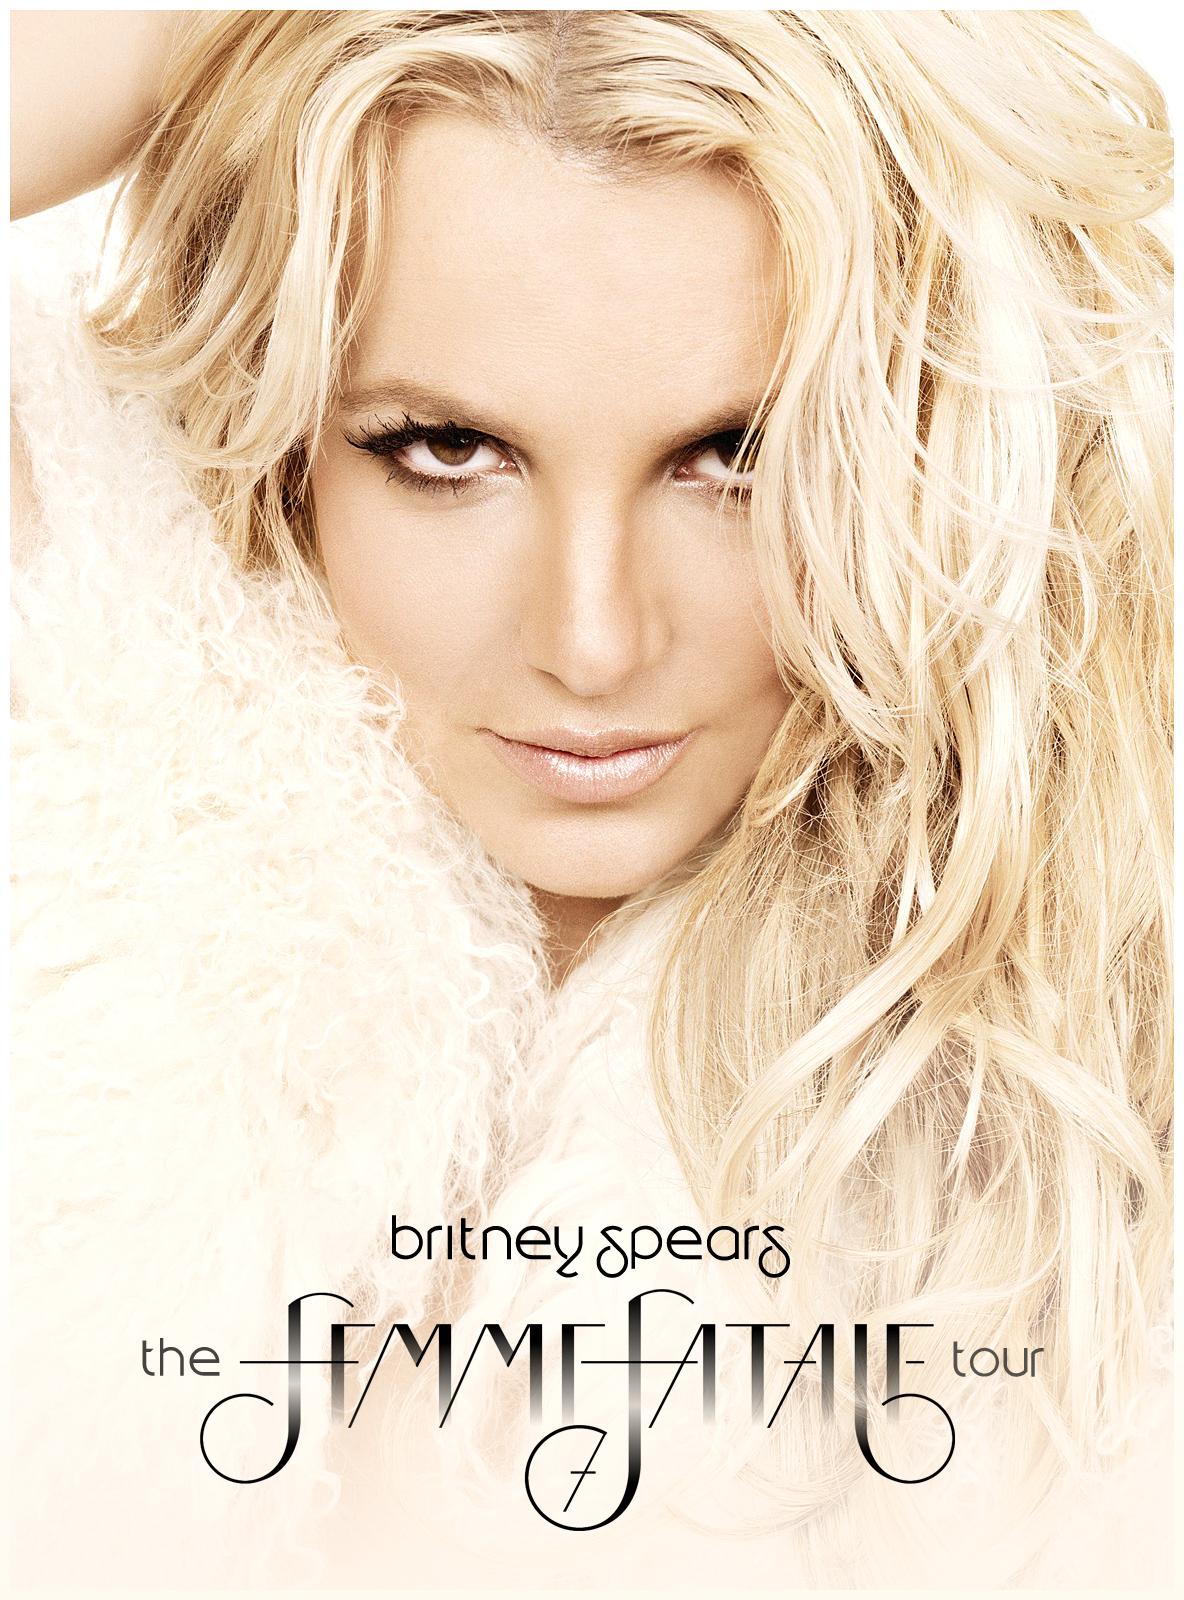 [TV] Britney Spears - Femme Fatale Tour: Video Promocional ...